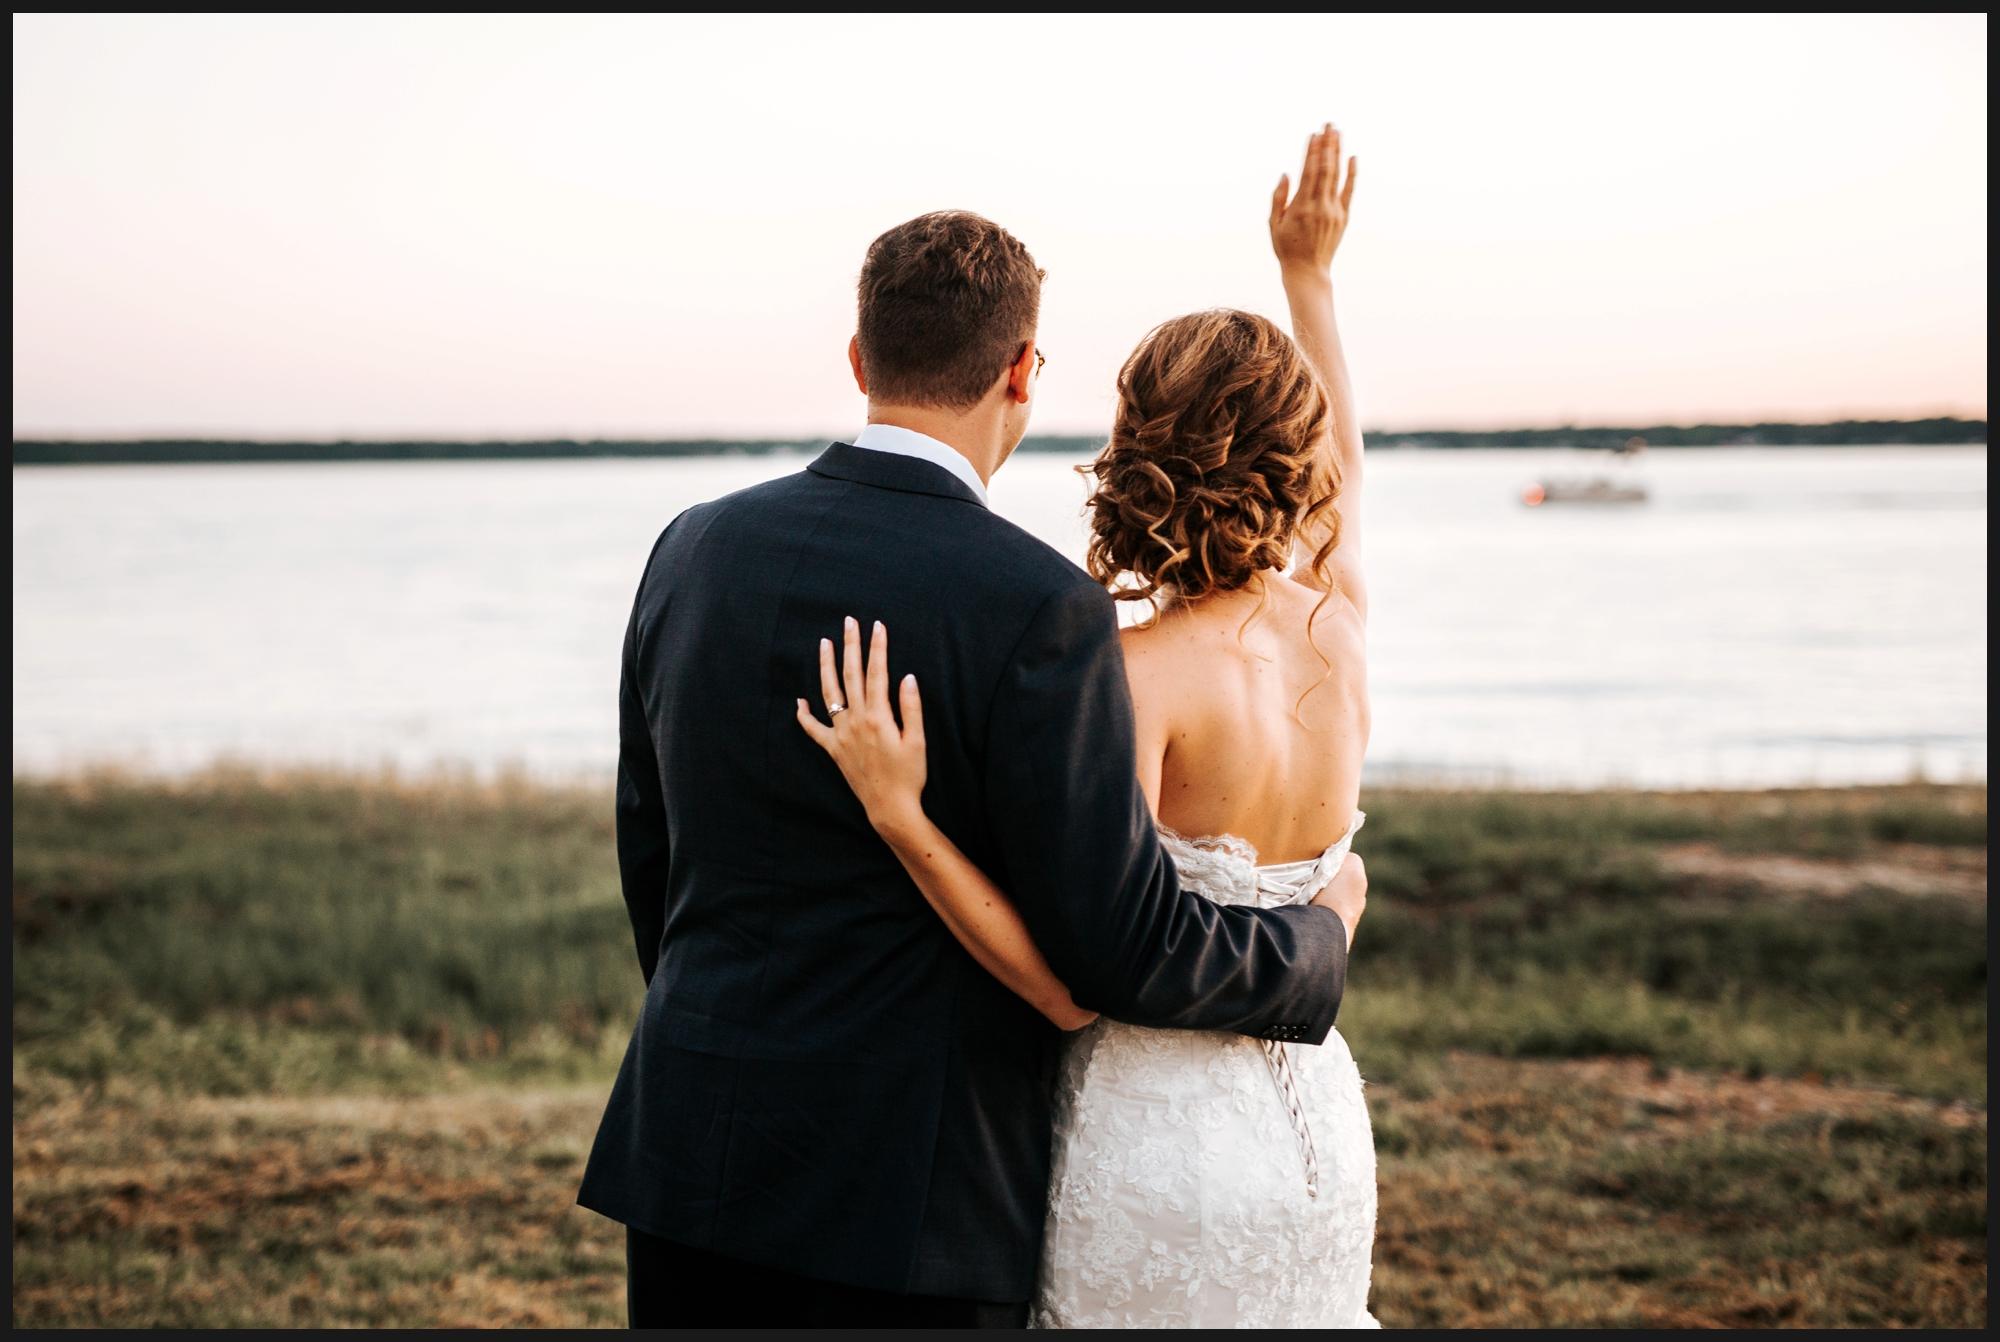 Orlando-Wedding-Photographer-destination-wedding-photographer-florida-wedding-photographer-bohemian-wedding-photographer_0120.jpg